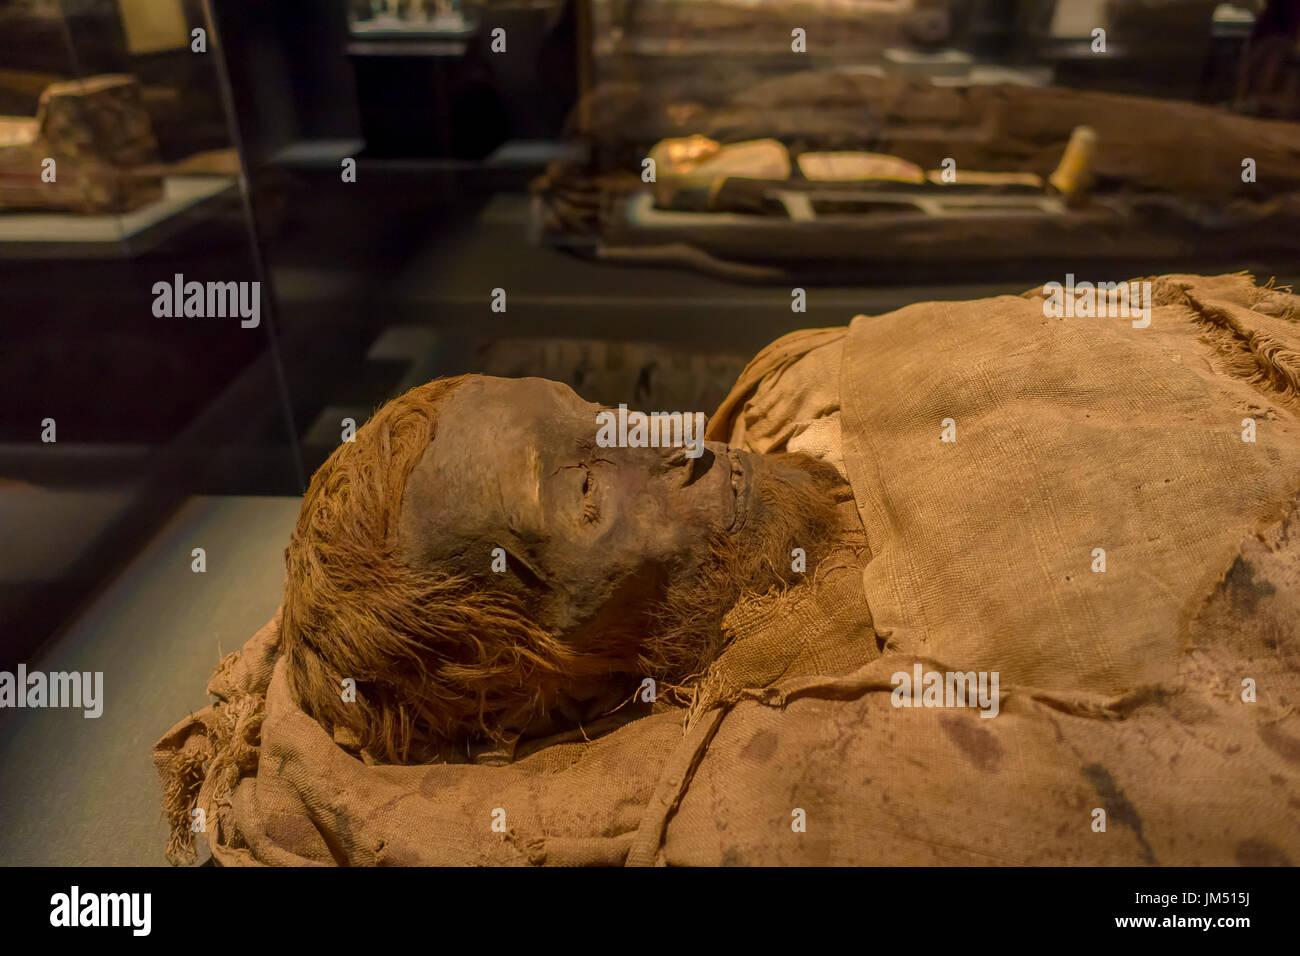 Egypt Mummy Close Up Stock Photos Amp Egypt Mummy Close Up